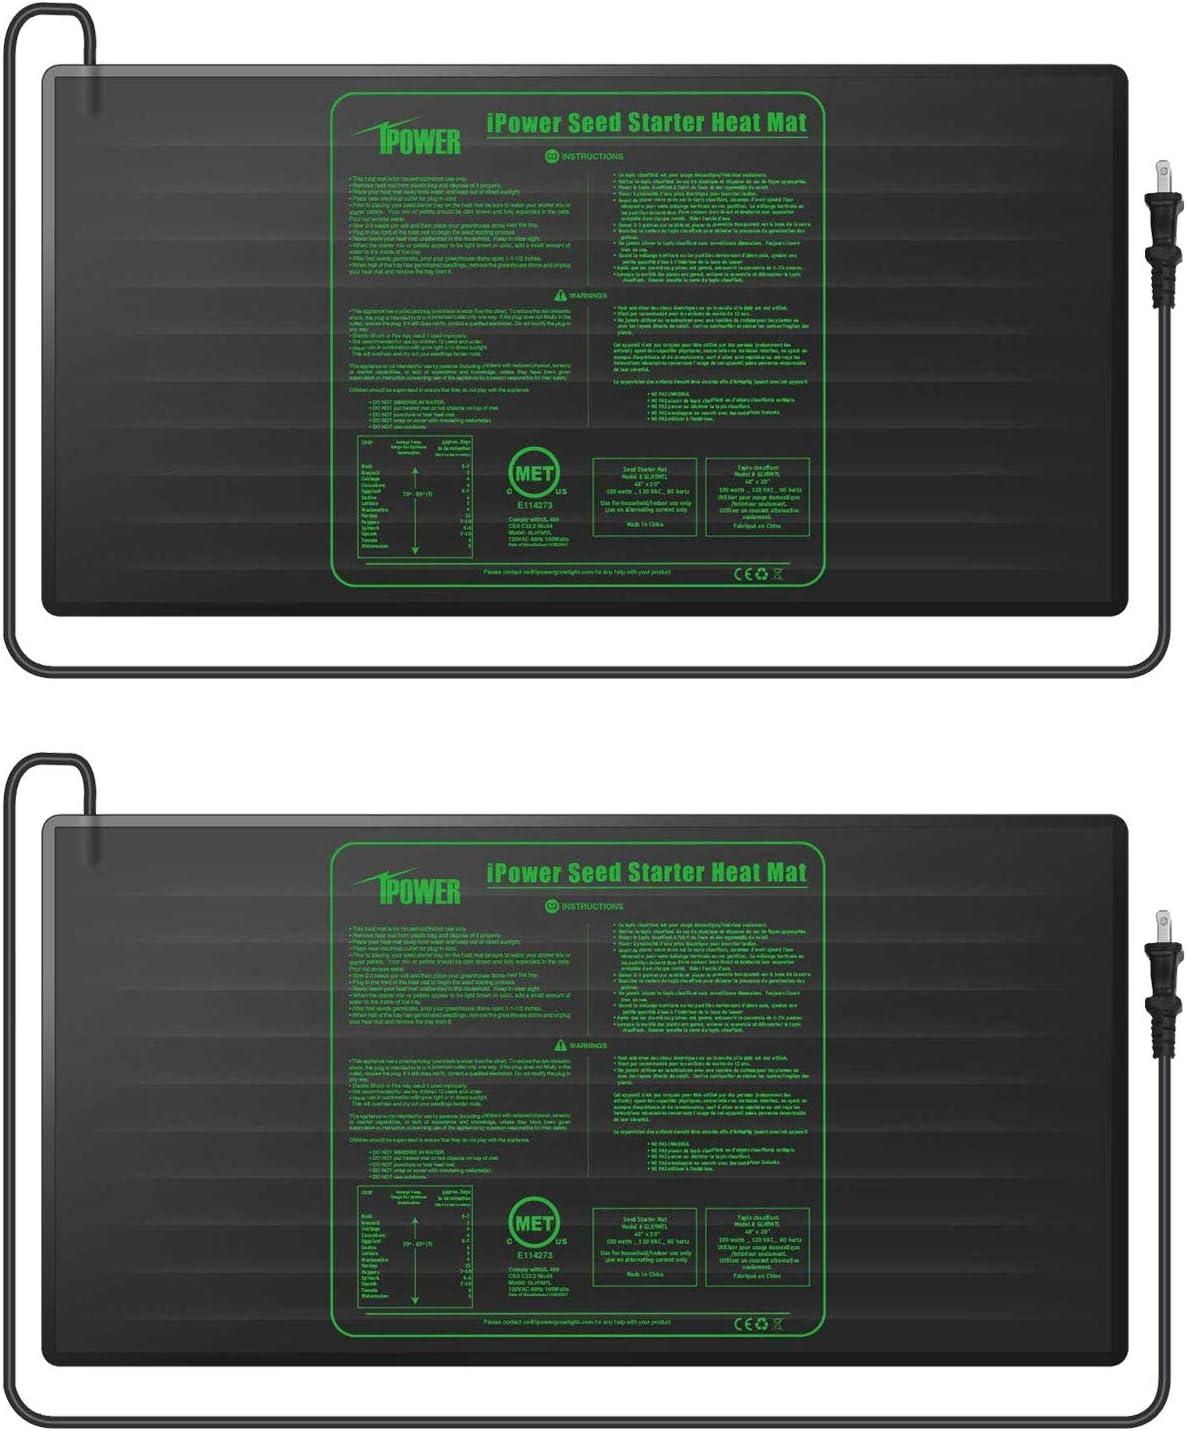 iPower GLHTMTLX2 2-Pack Durable Waterproof Seedling Mat 48 x 20 Warm Hydroponic Heating Pad, Black